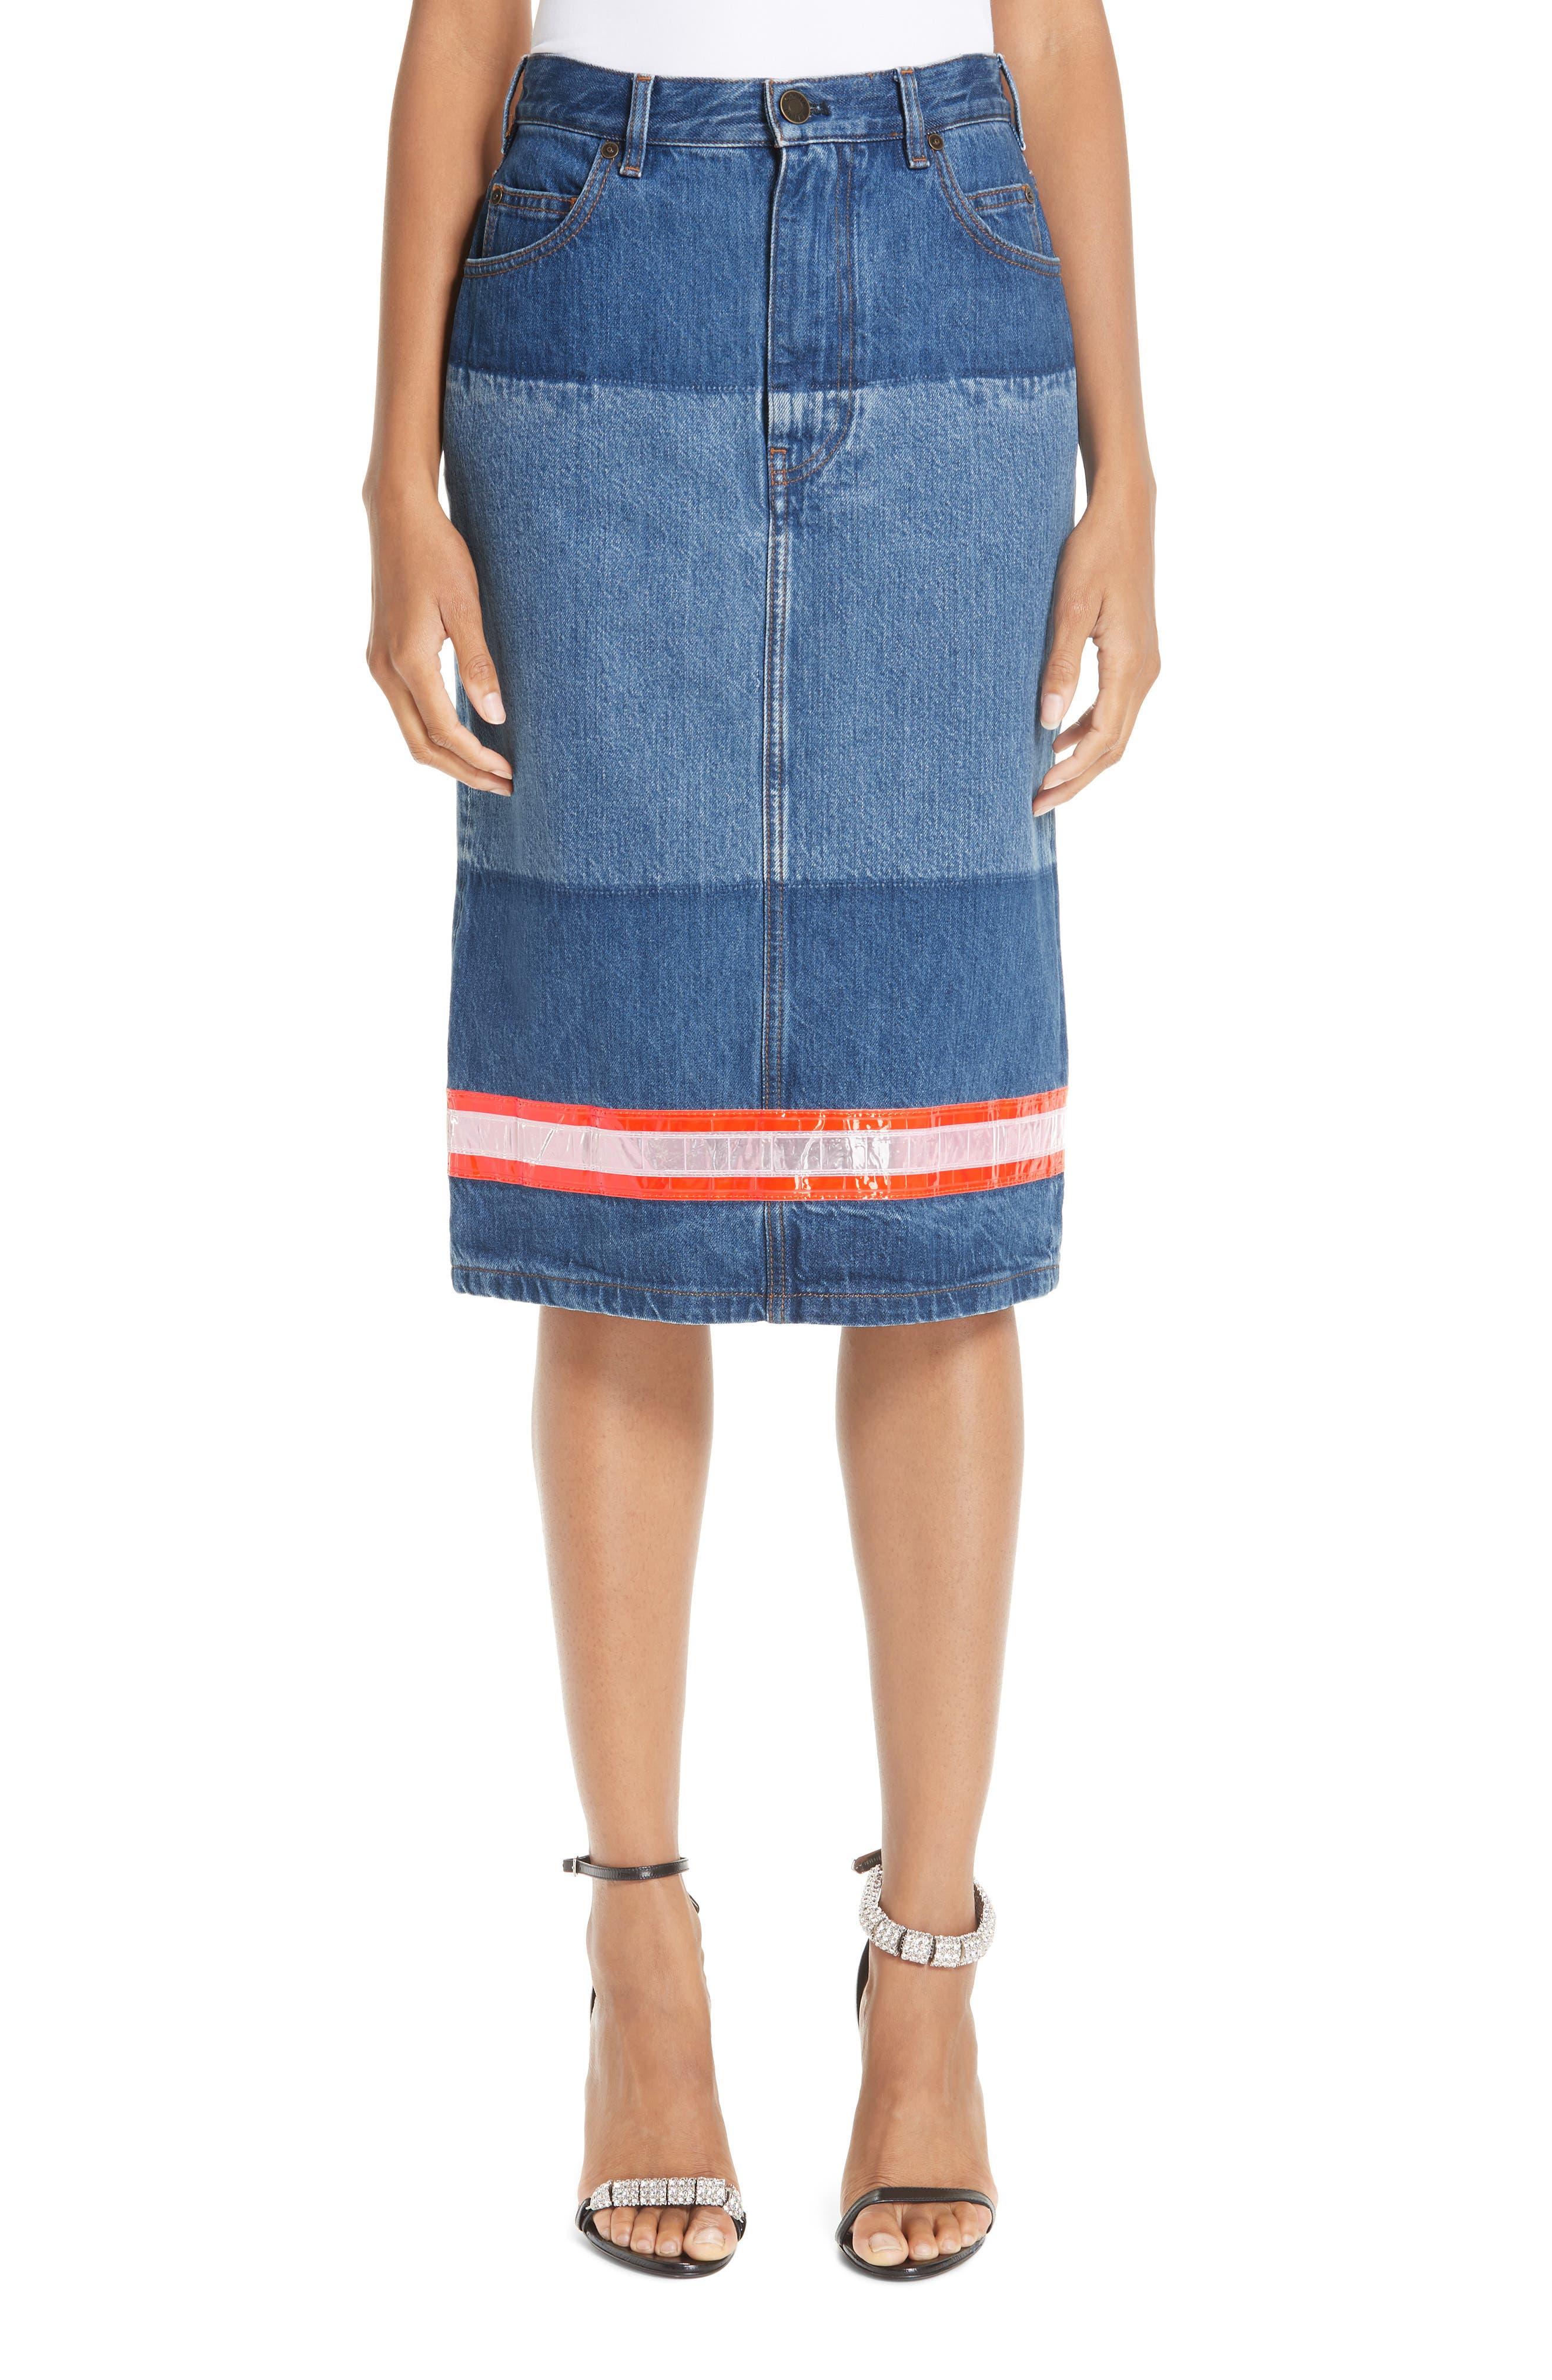 CALVIN KLEIN 205W39NYC Reflective Stripe Mixed Wash Denim Skirt, Main, color, BLUE